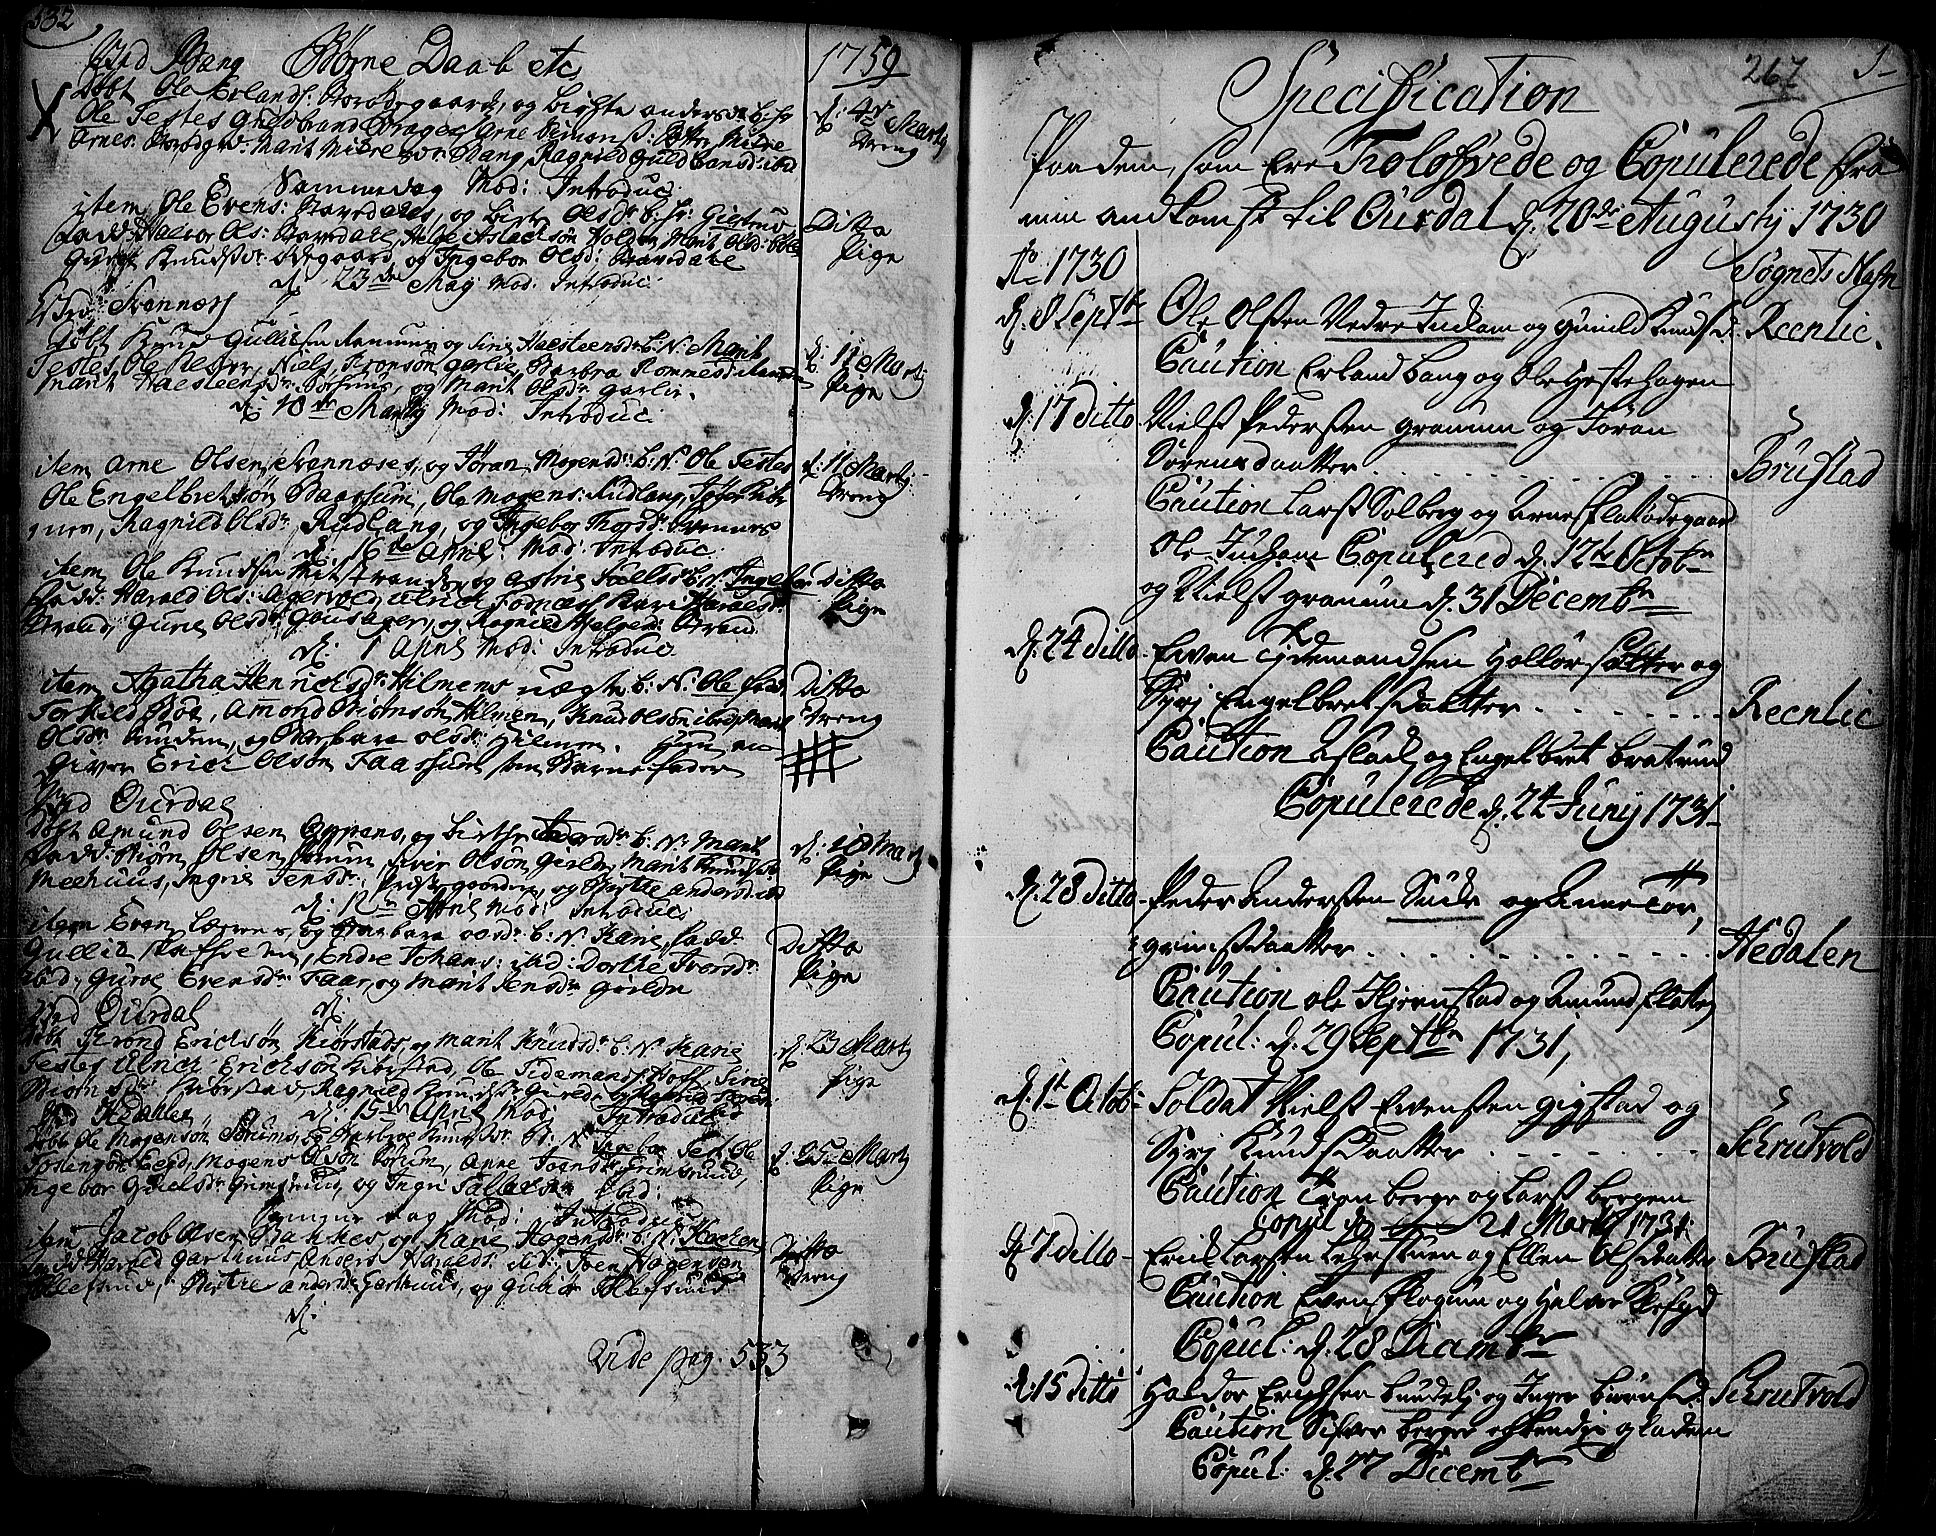 SAH, Aurdal prestekontor, Ministerialbok nr. 4, 1730-1762, s. 532-1